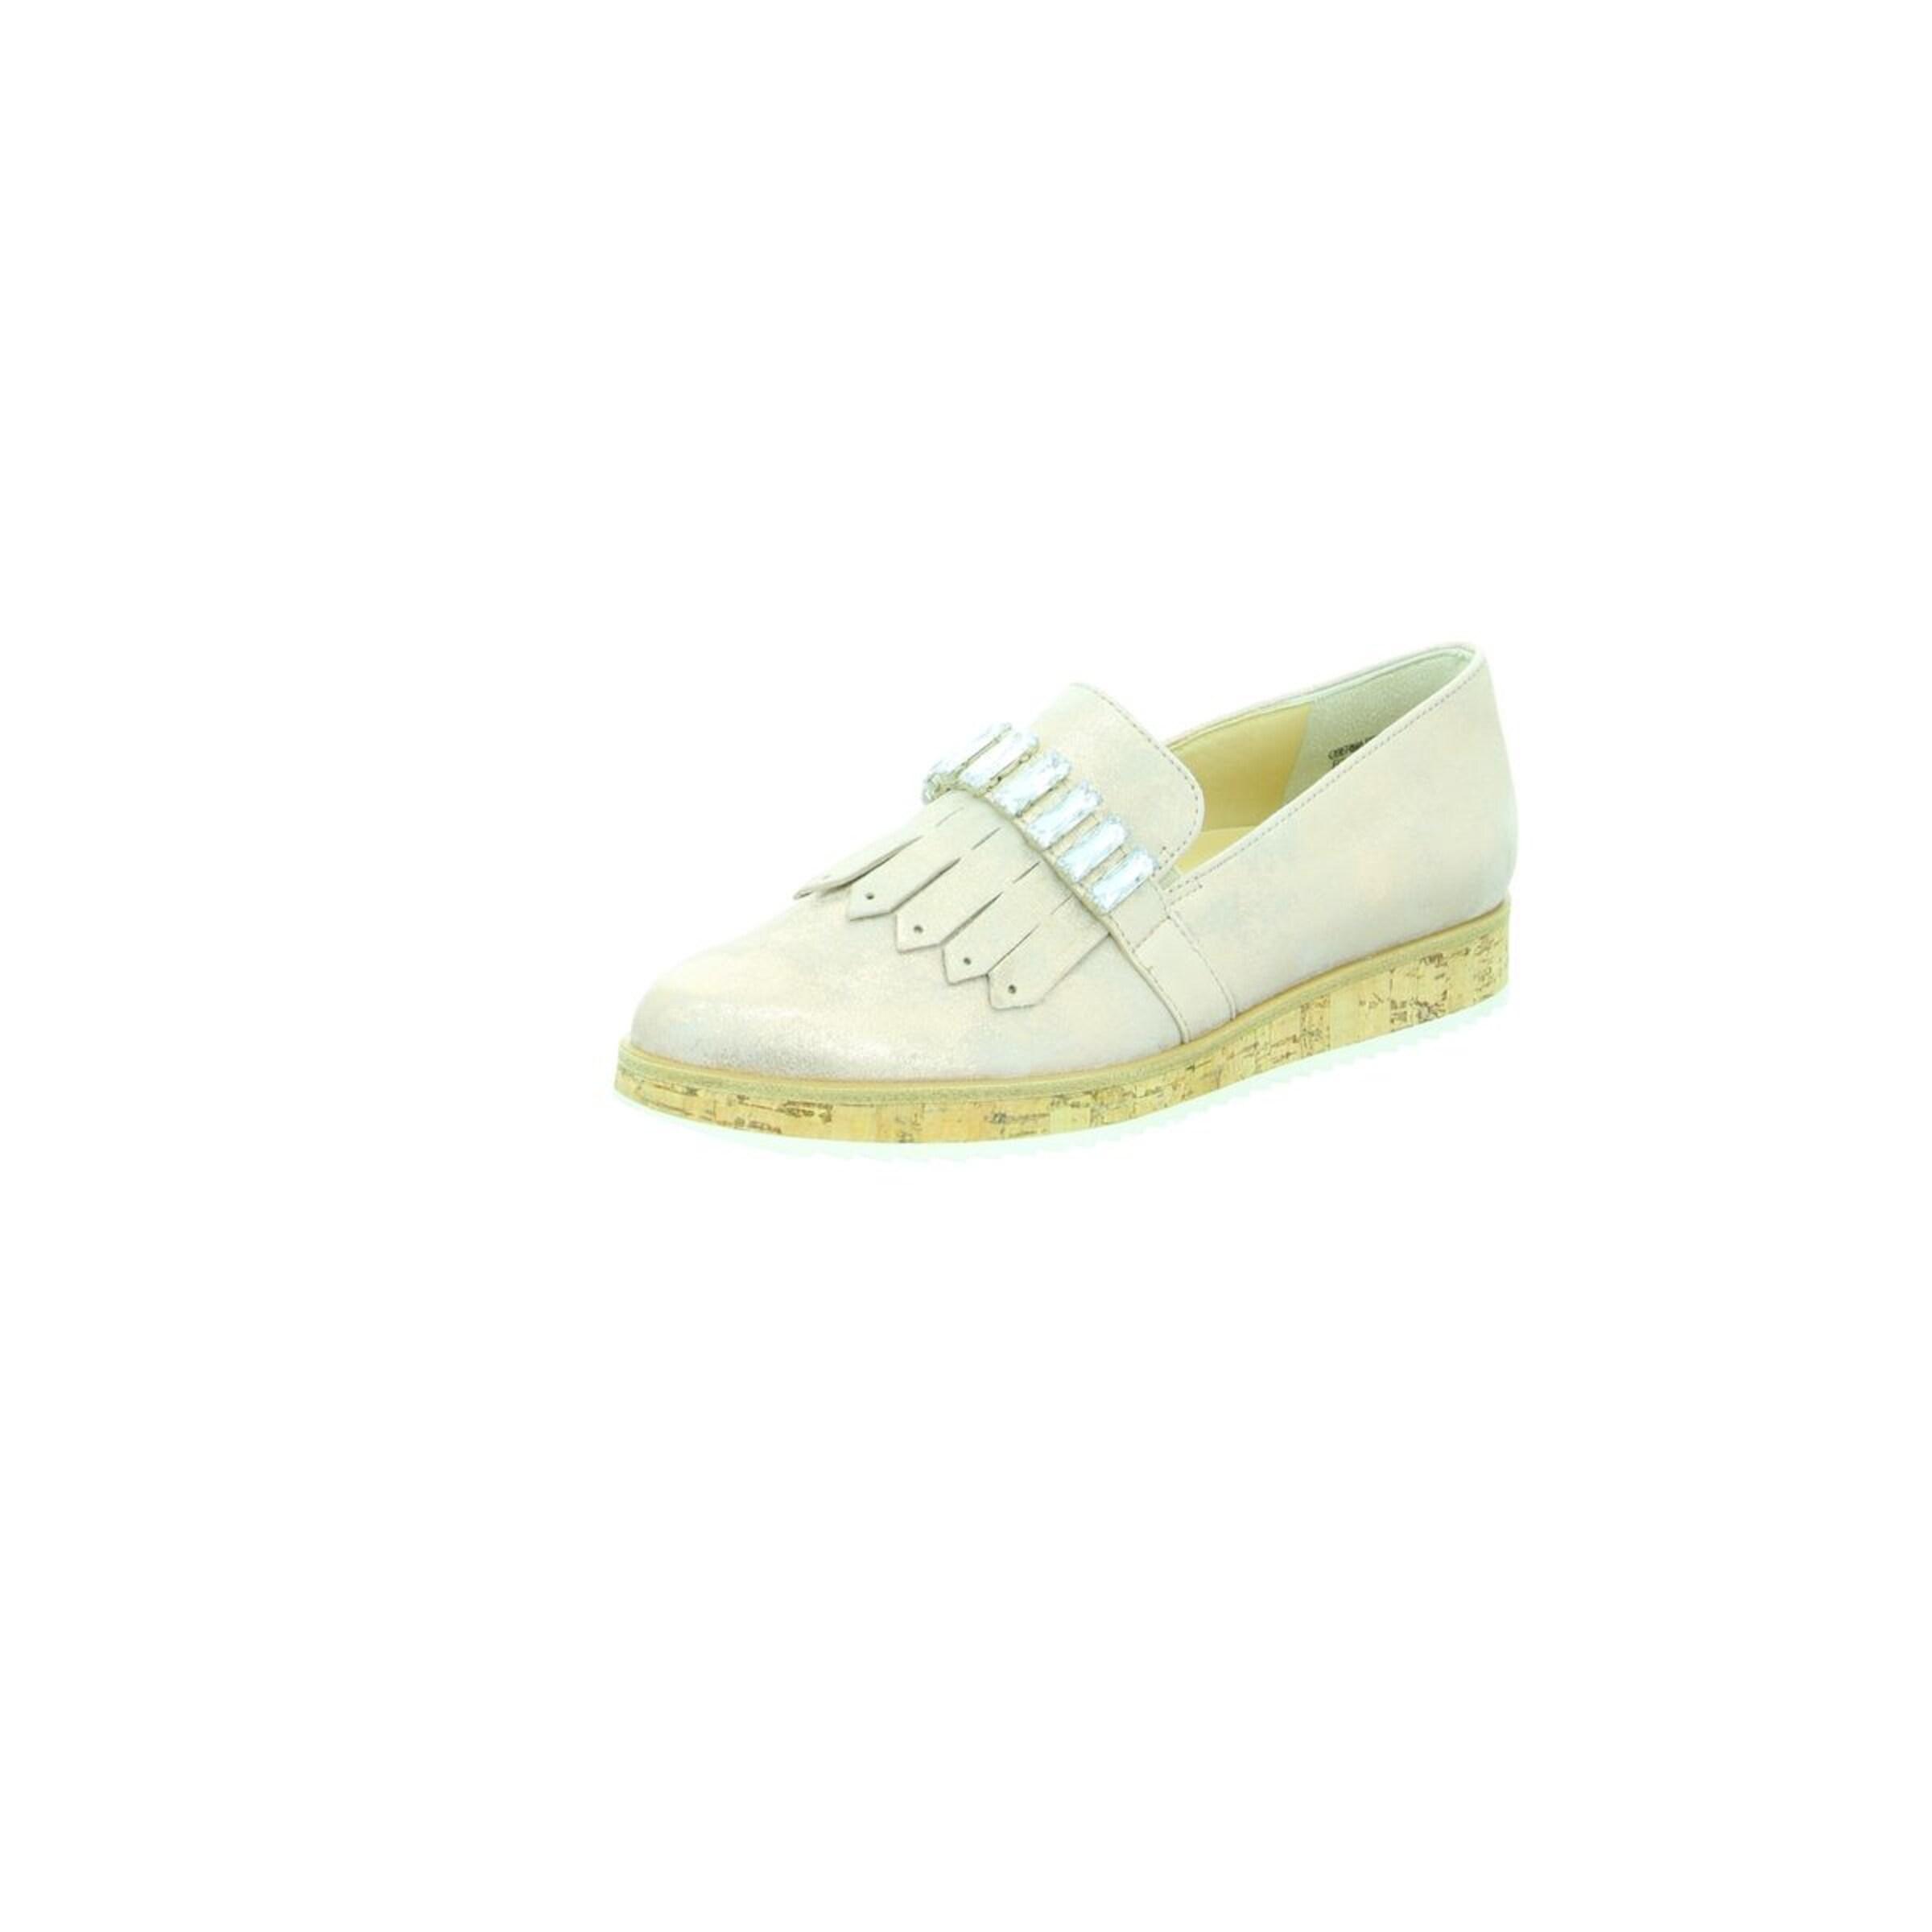 Adidas ZX Flux Navy Weiß Herren Sneakers Günstig Online